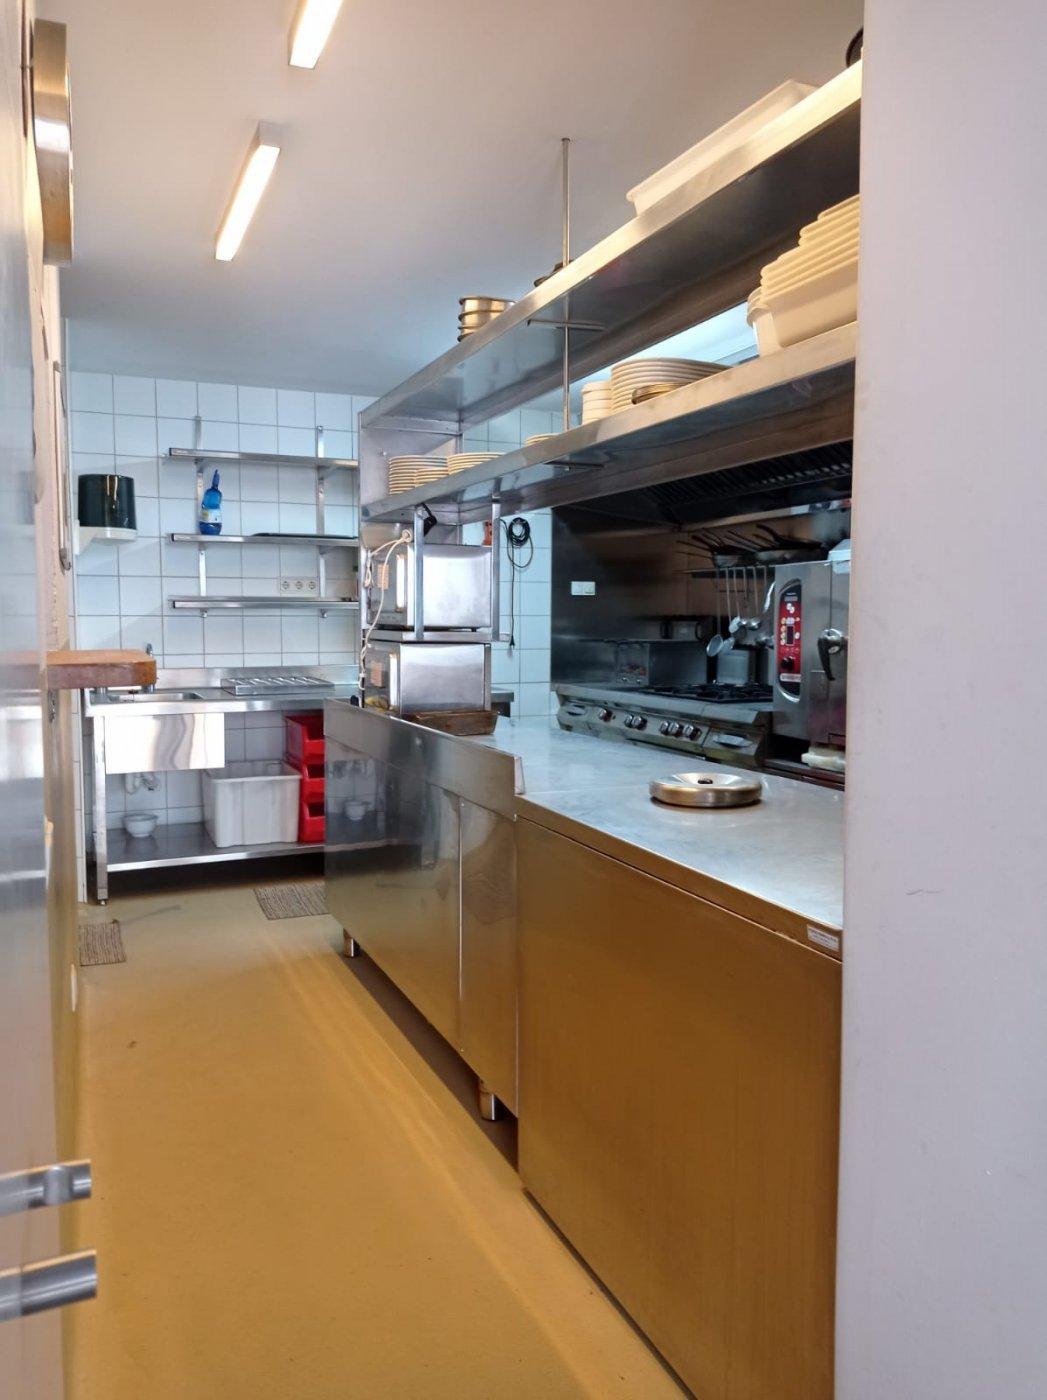 Venta o alquiler con opciÓn a compra de restaurante-bar en el centro de mahÓn totalmente e - imagenInmueble15